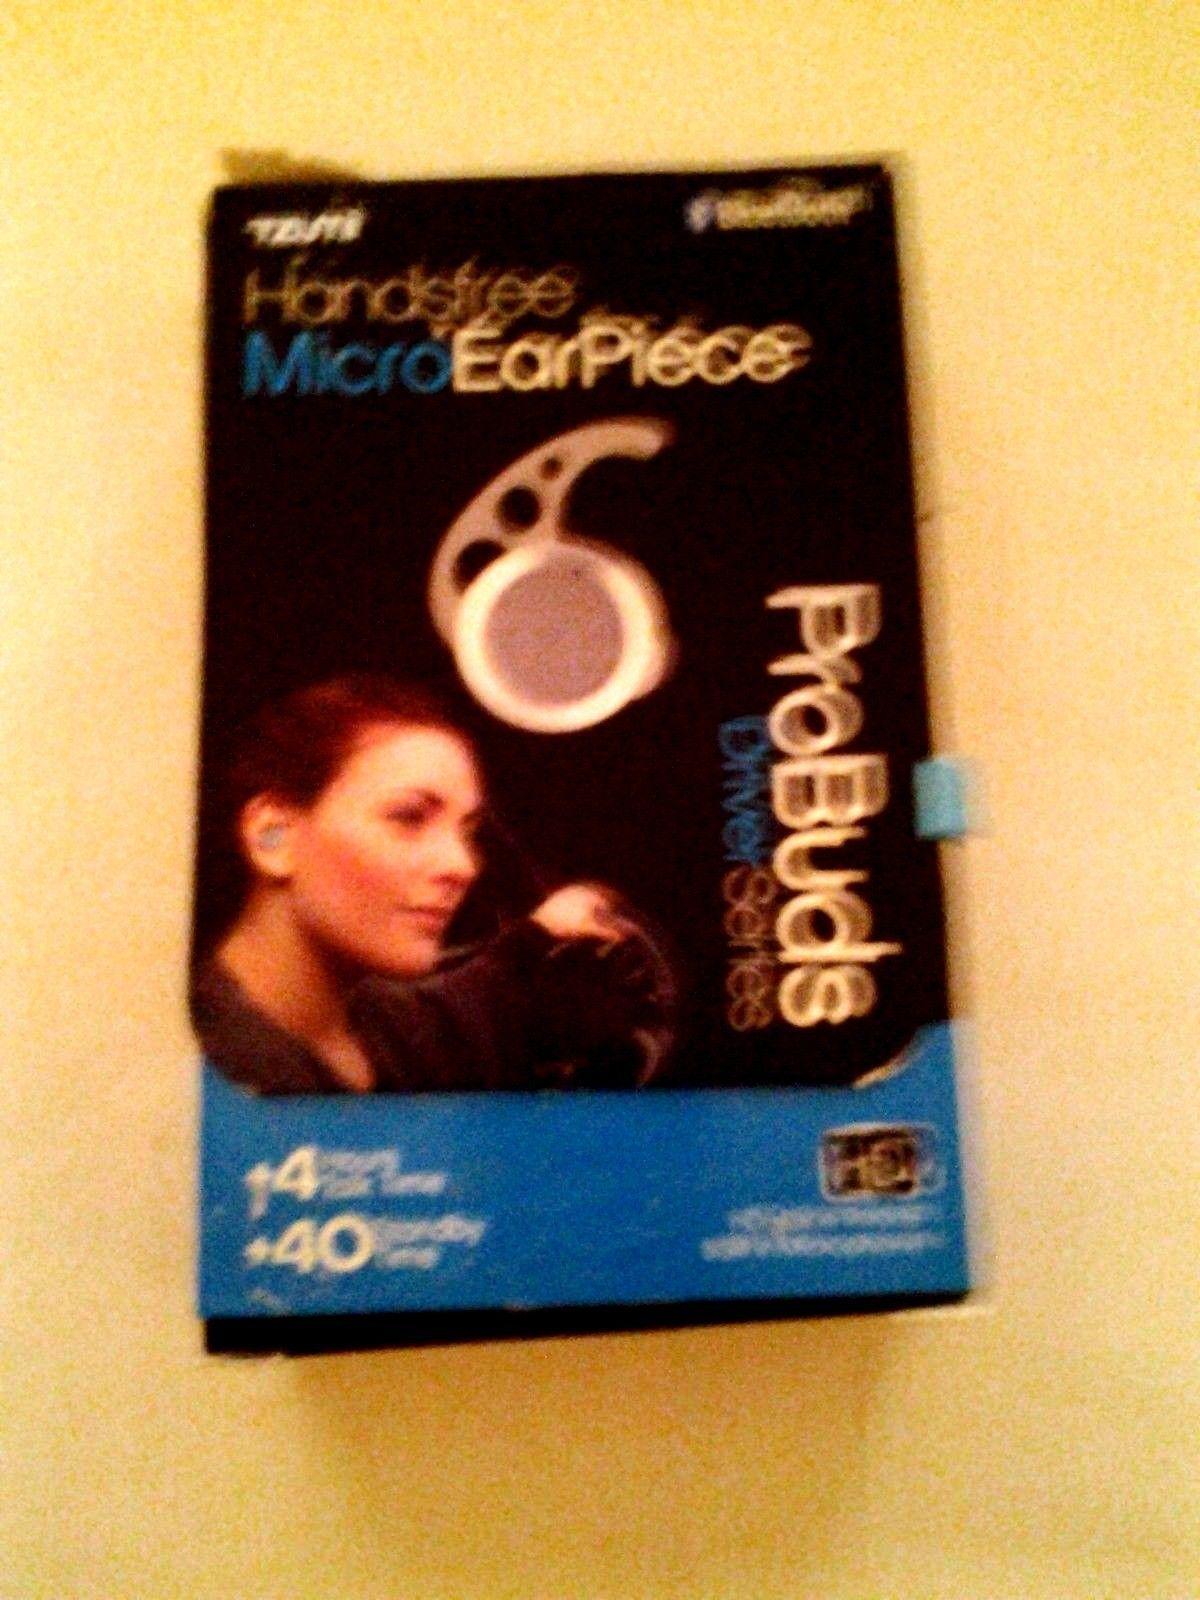 Tzumi HandsFree Micro Ear Piece ProBuds and 50 similar items